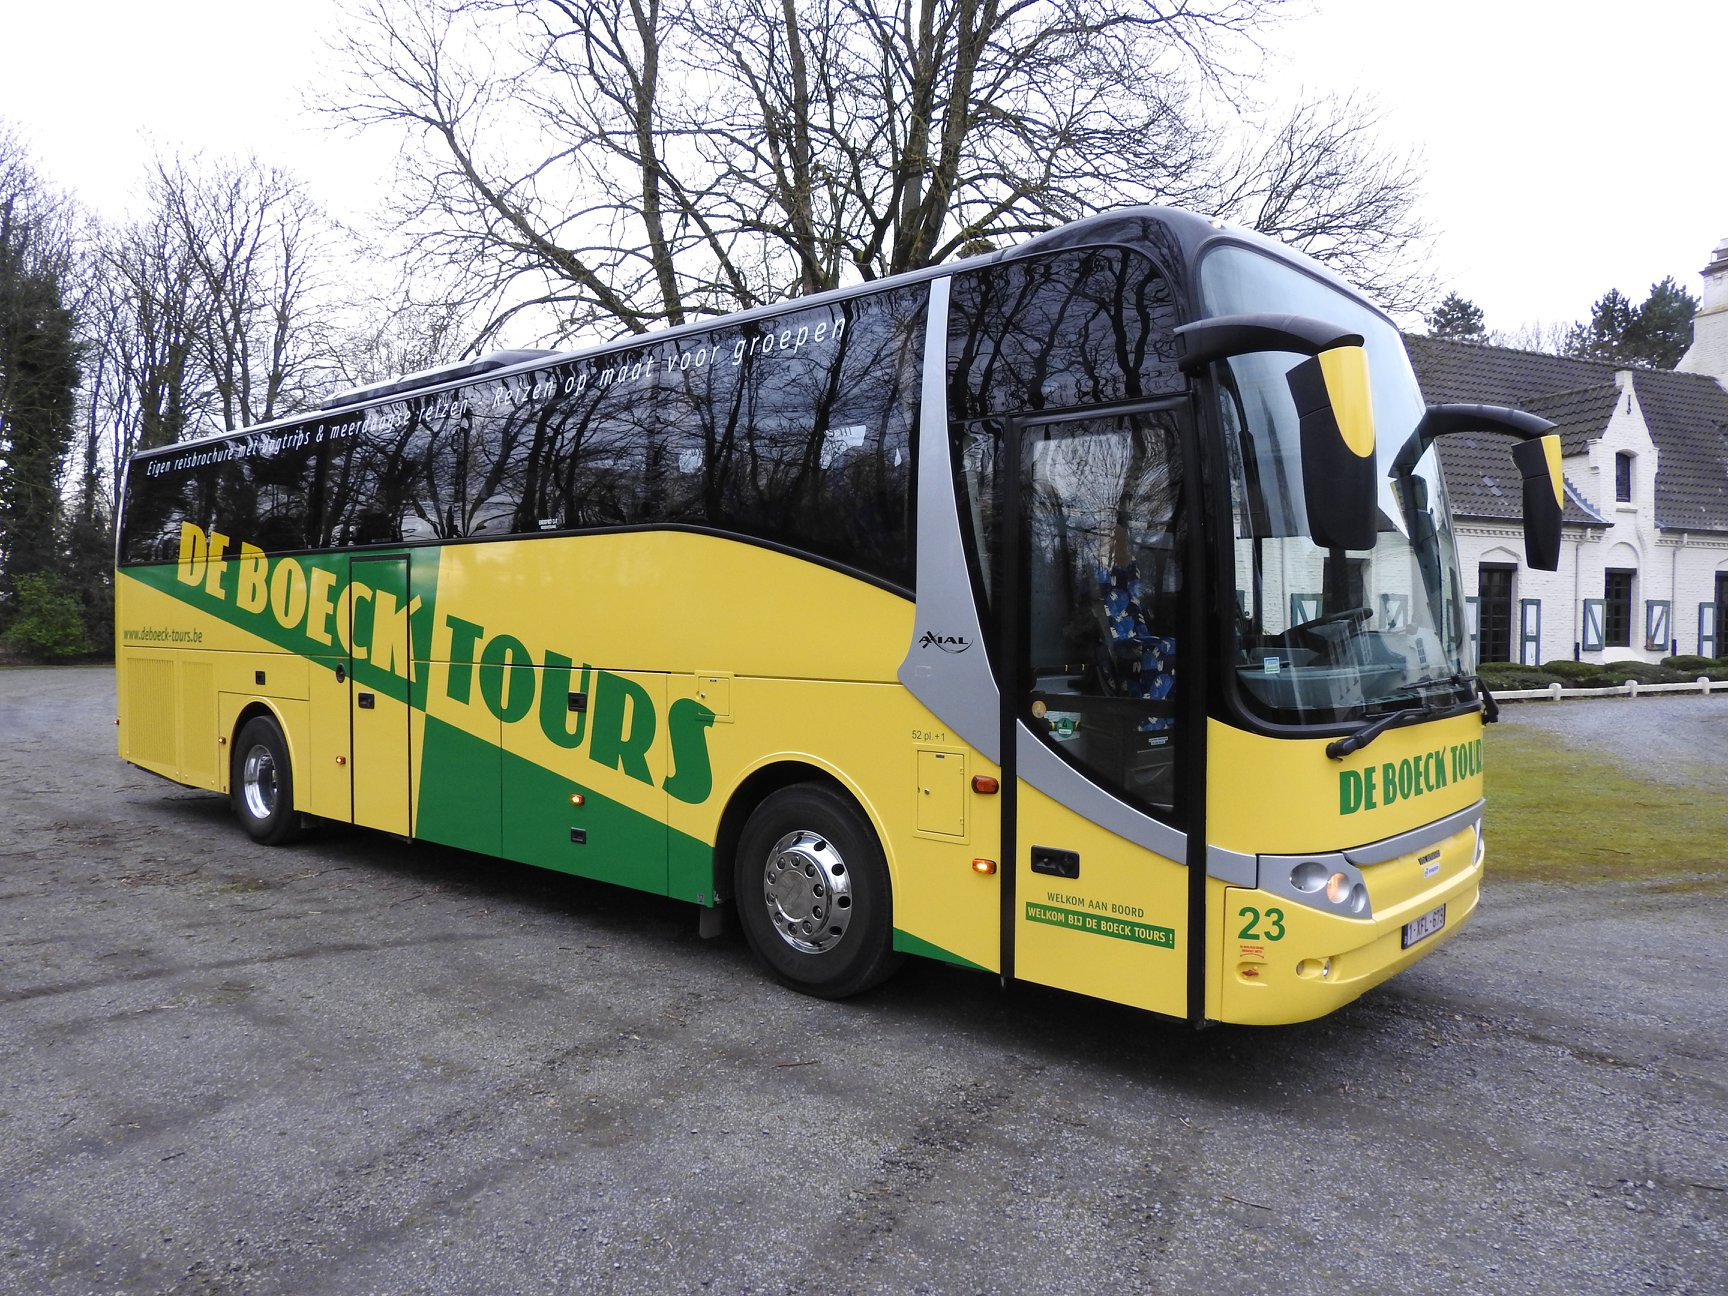 Speedy-14-2-2020-VDL-Volvo-430-Pk--1